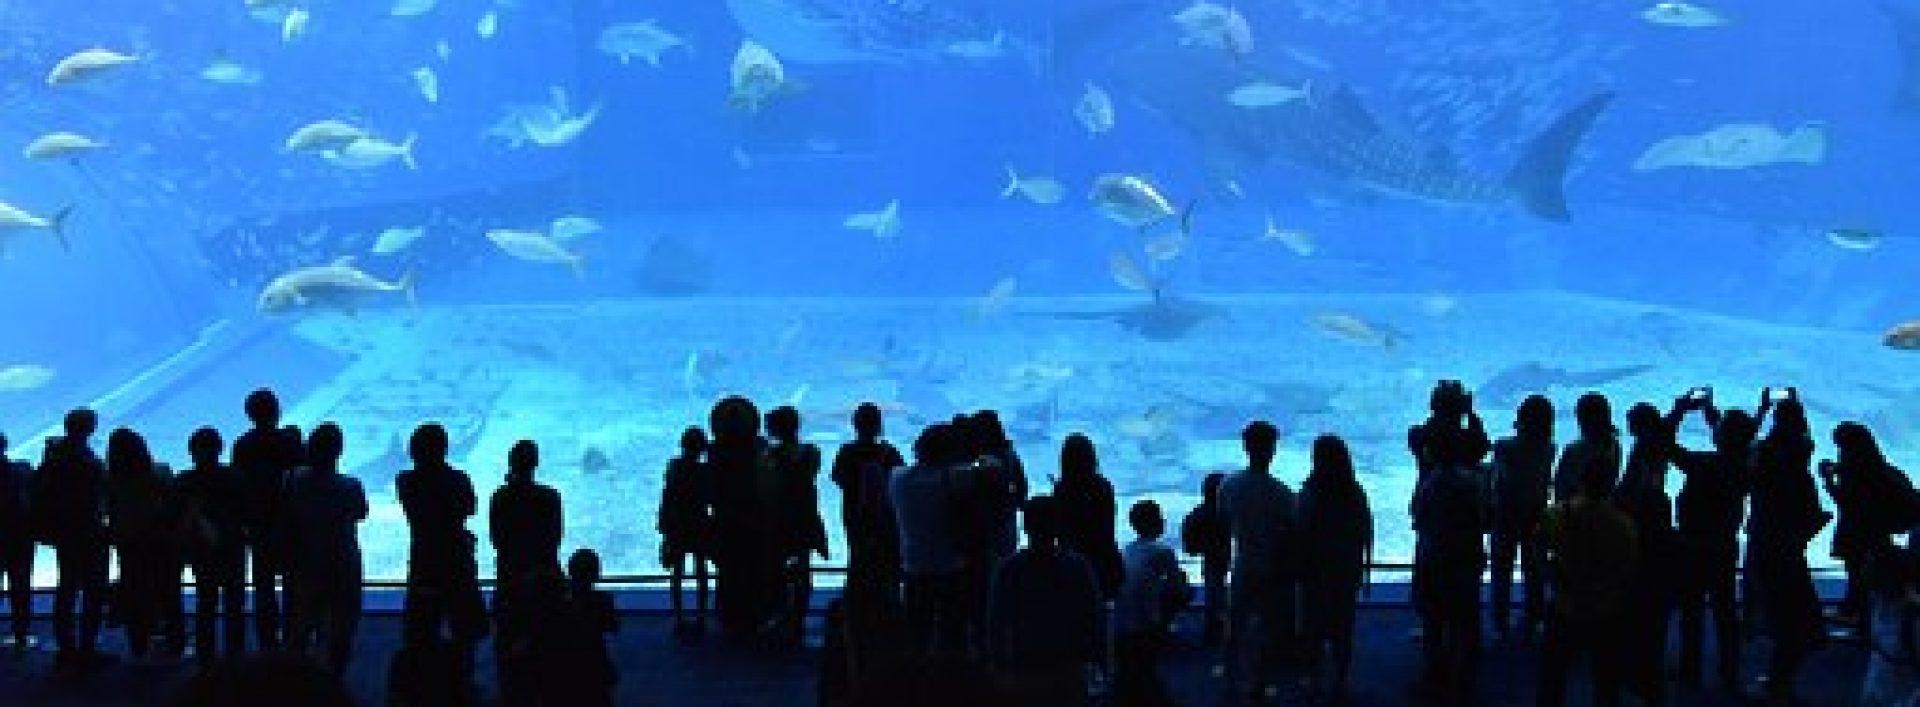 cropped-churaumi-aquarium-2407812__340-1.jpg